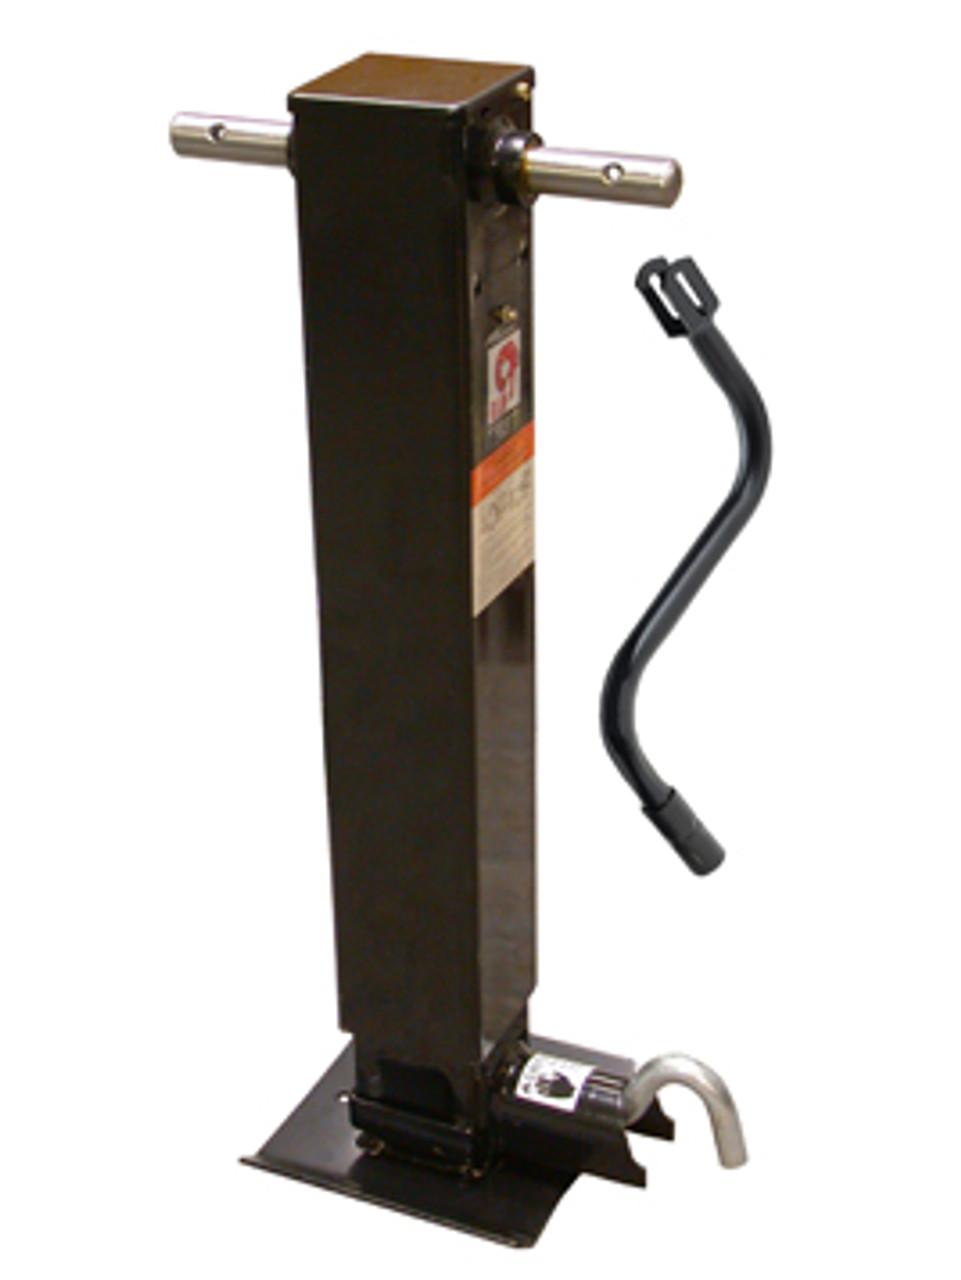 RAM182400SL --- RAM Drop Leg Sidewind Trailer Jack - 10,000 lb